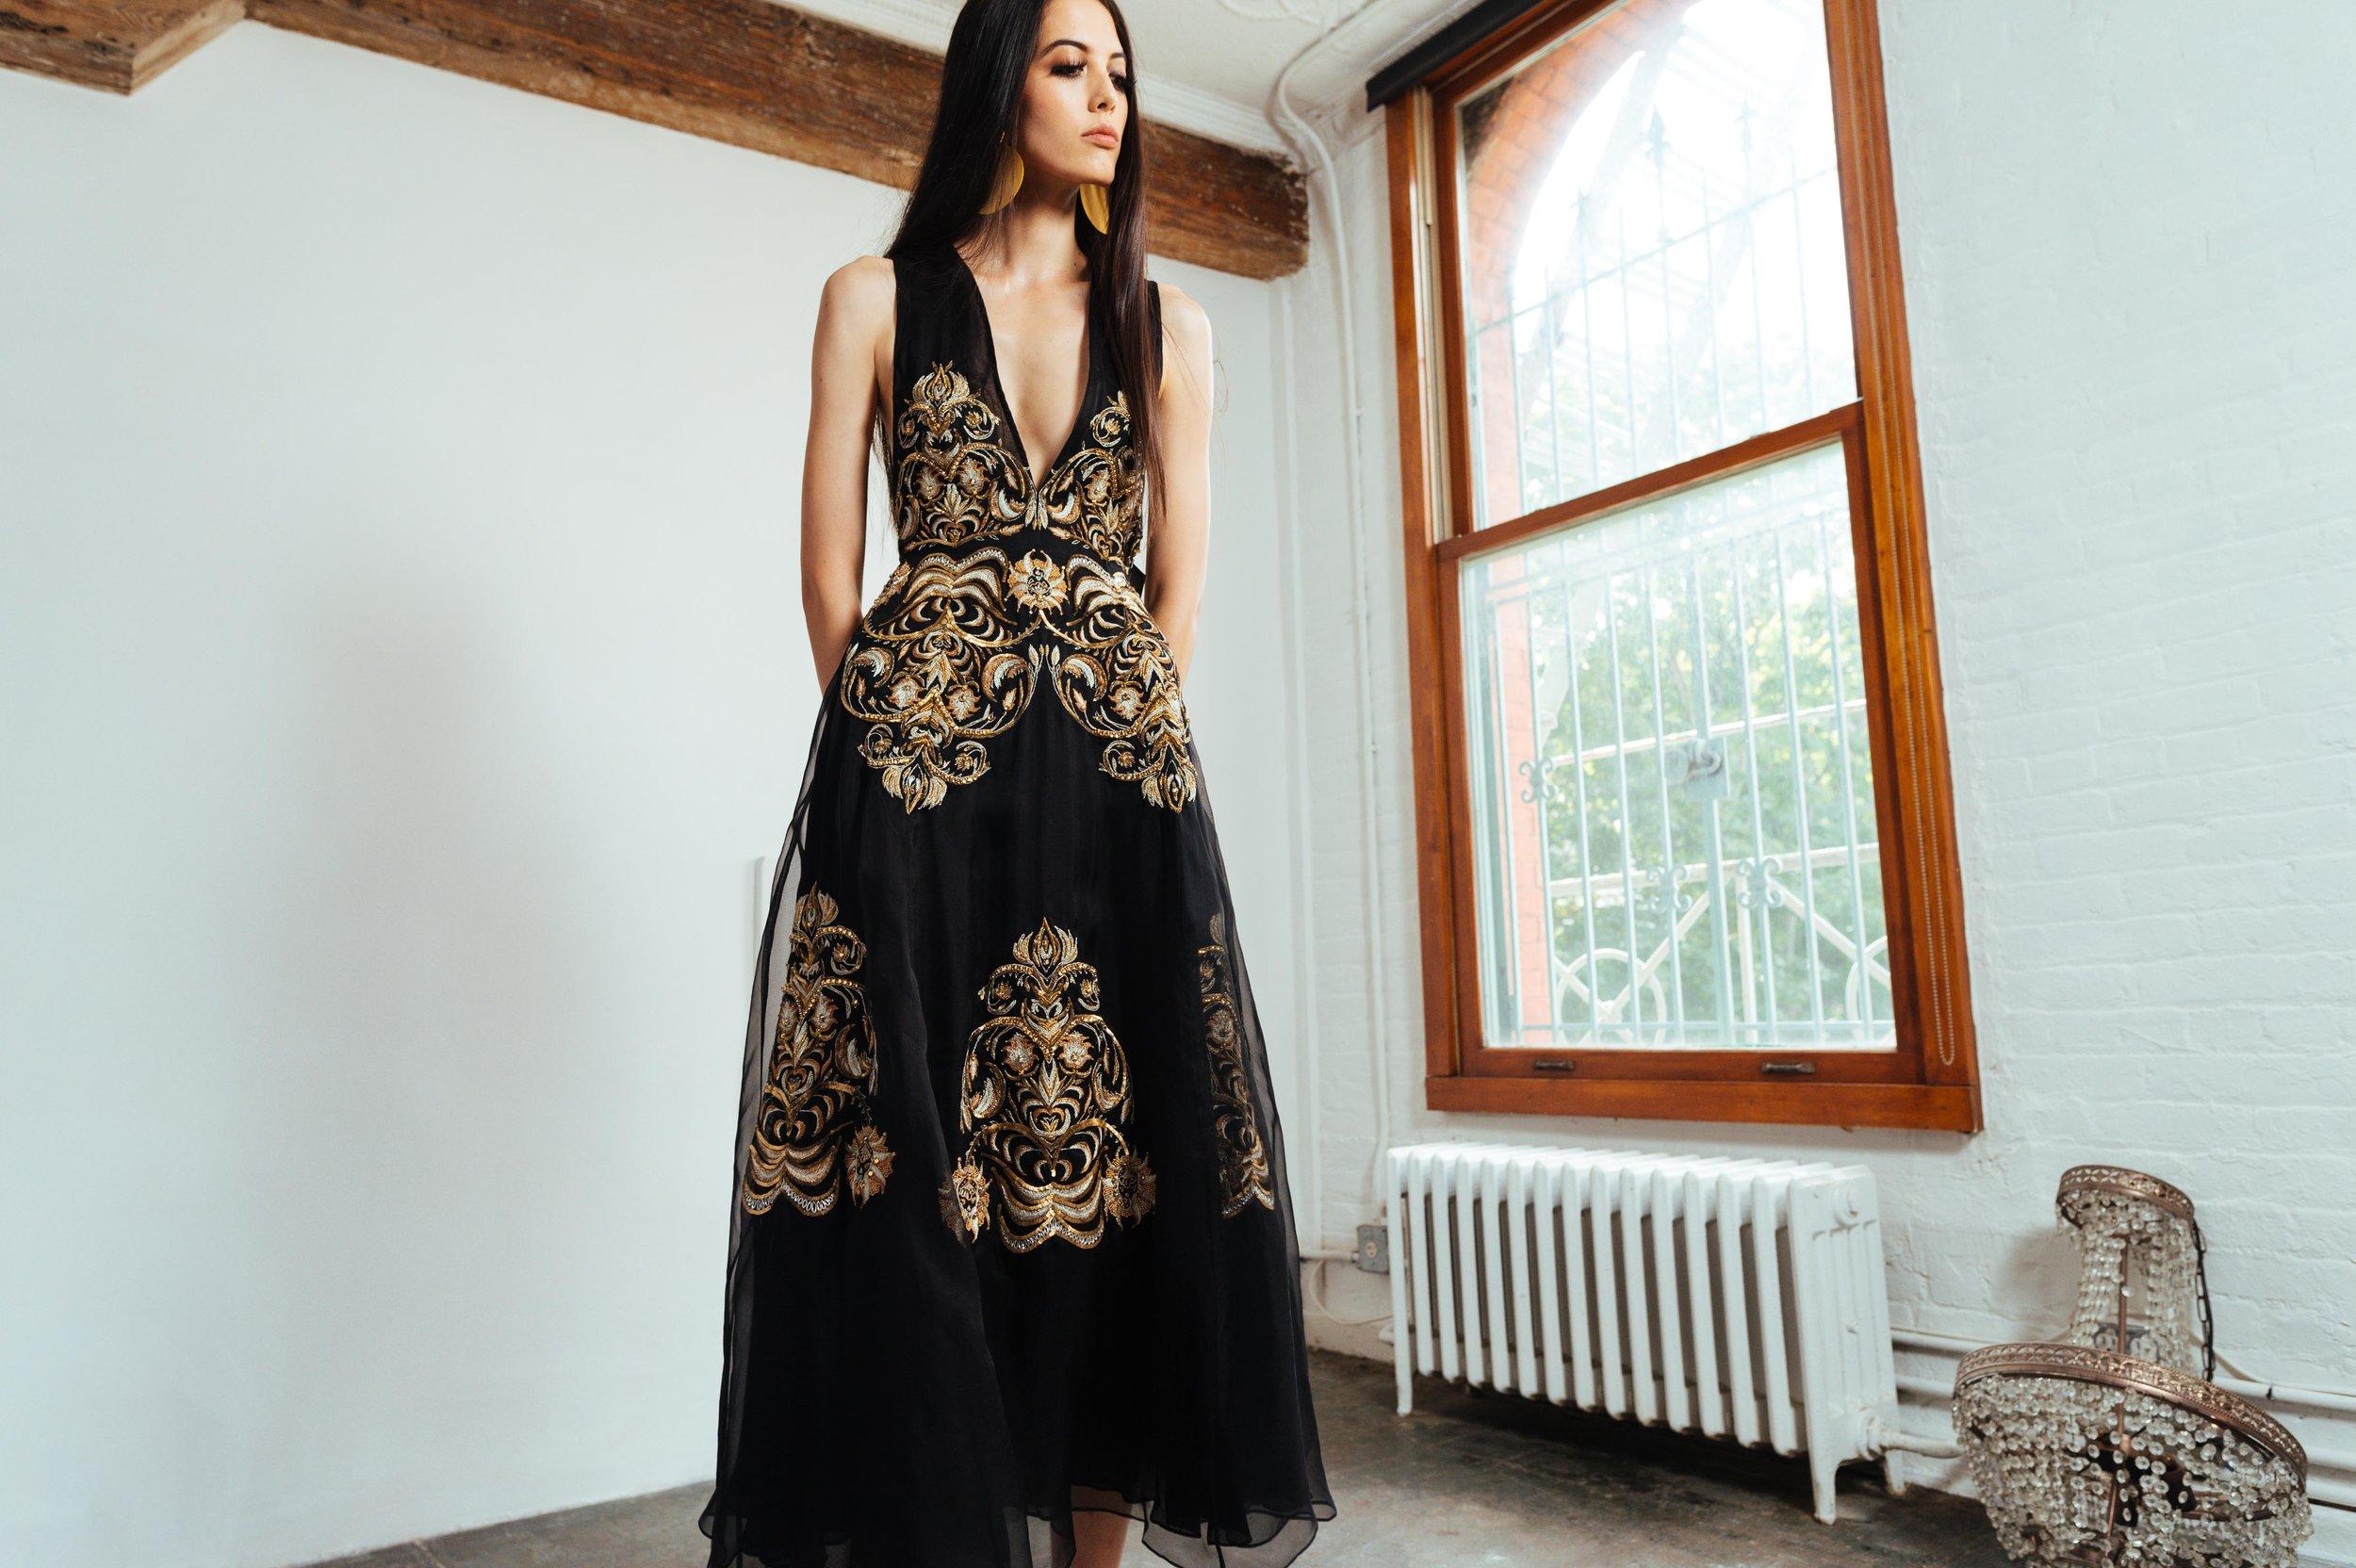 JEWEL FLOWER DRESS